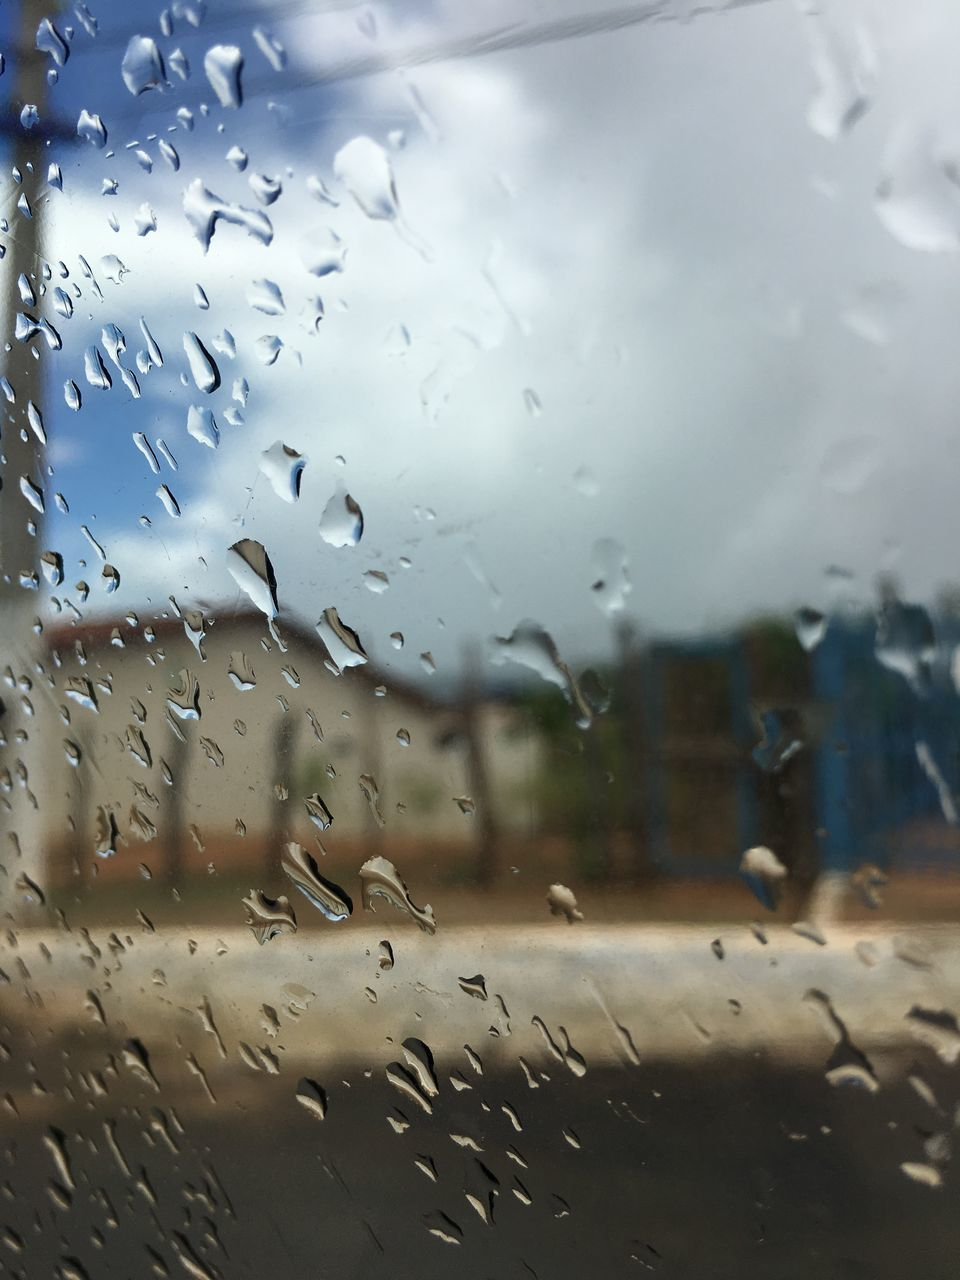 wet, drop, rain, window, glass - material, transparent, water, focus on foreground, raindrop, nature, rainy season, indoors, mode of transportation, close-up, no people, car, transportation, sky, glass